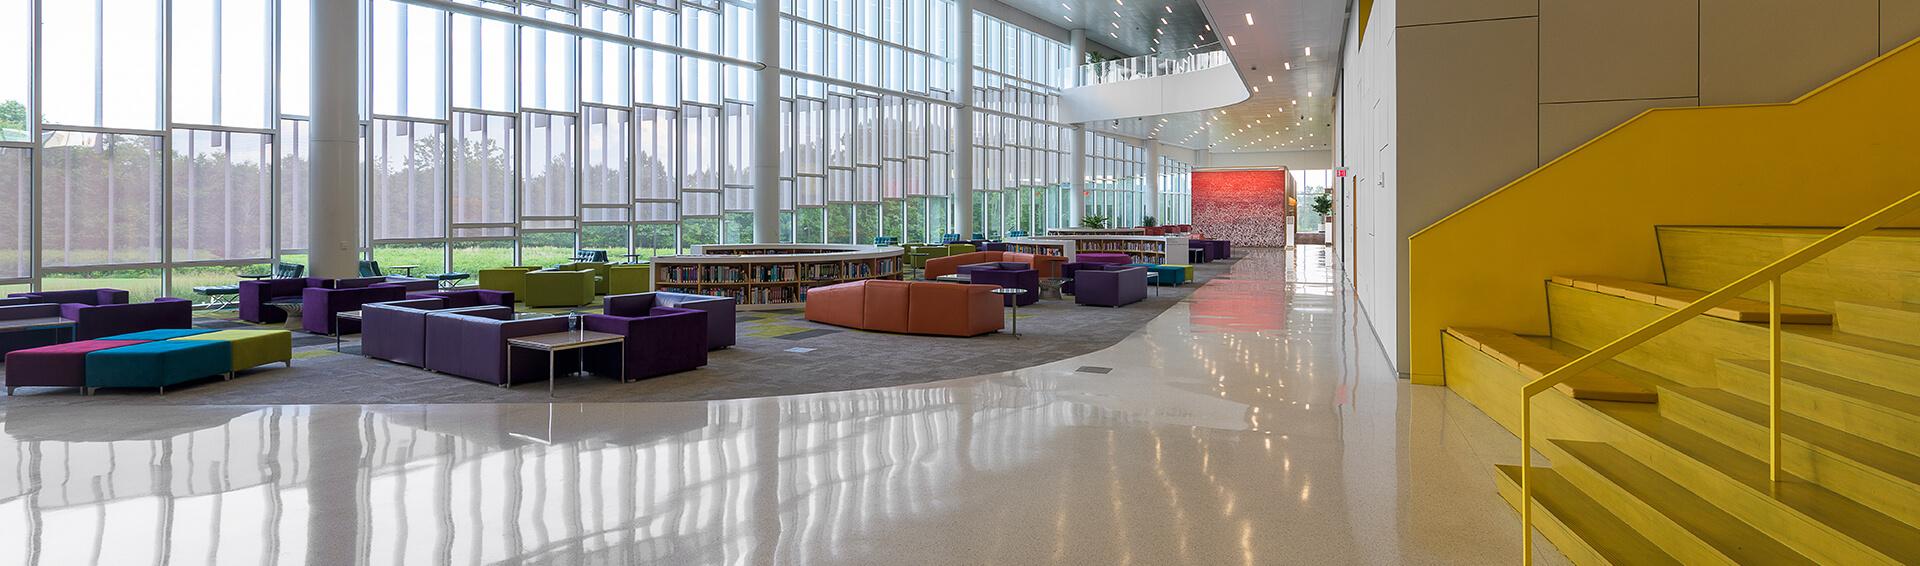 terrazzo flooring college library